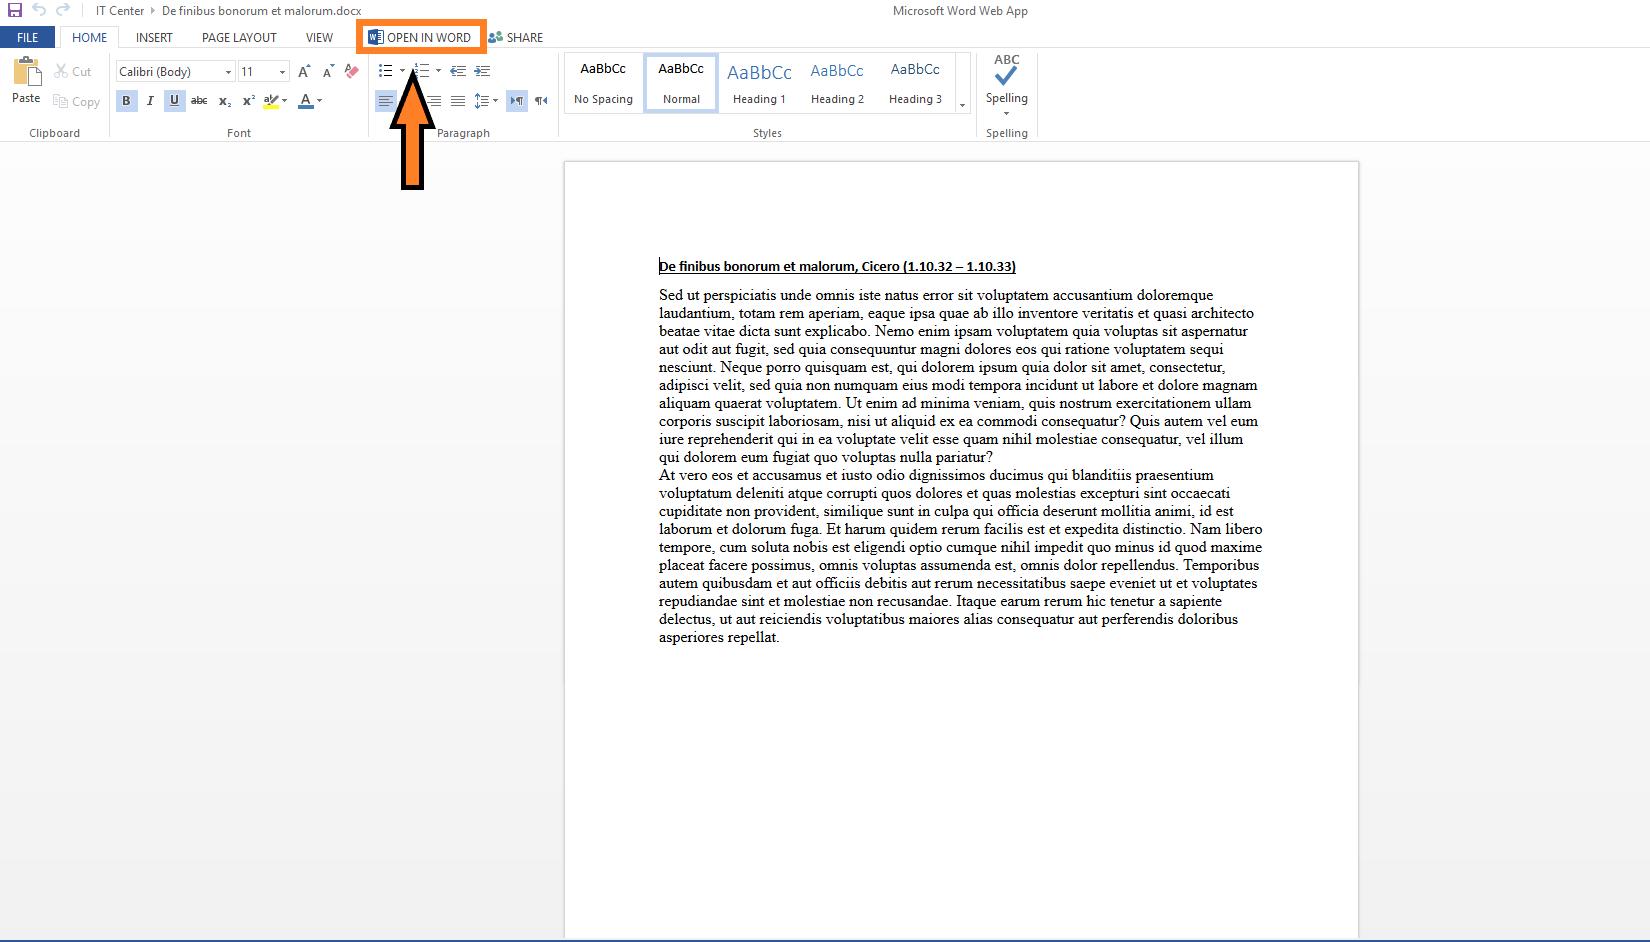 Word Web App editing-view